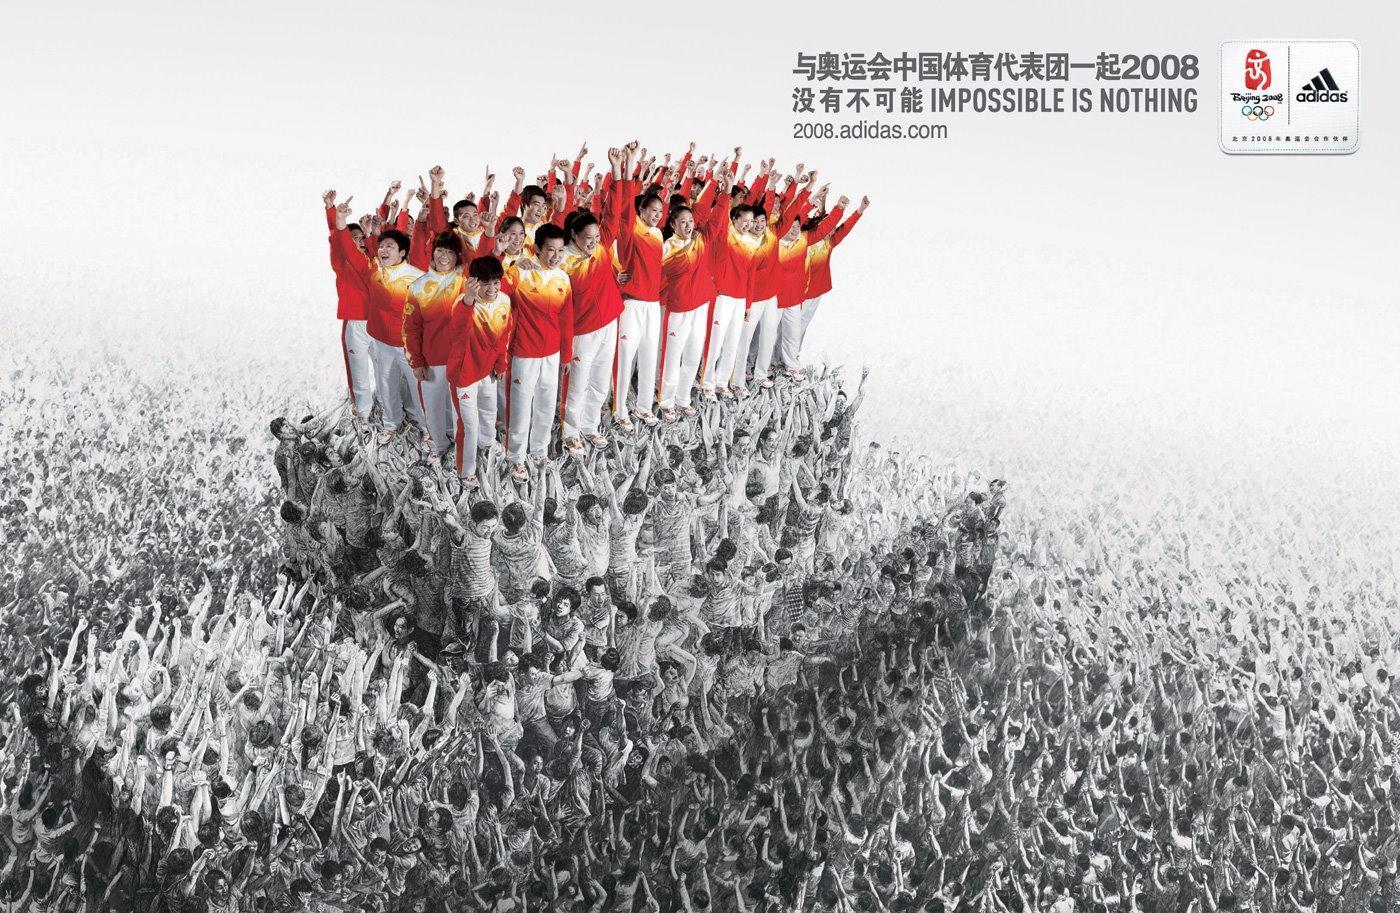 adidasgroup.jpg (image)